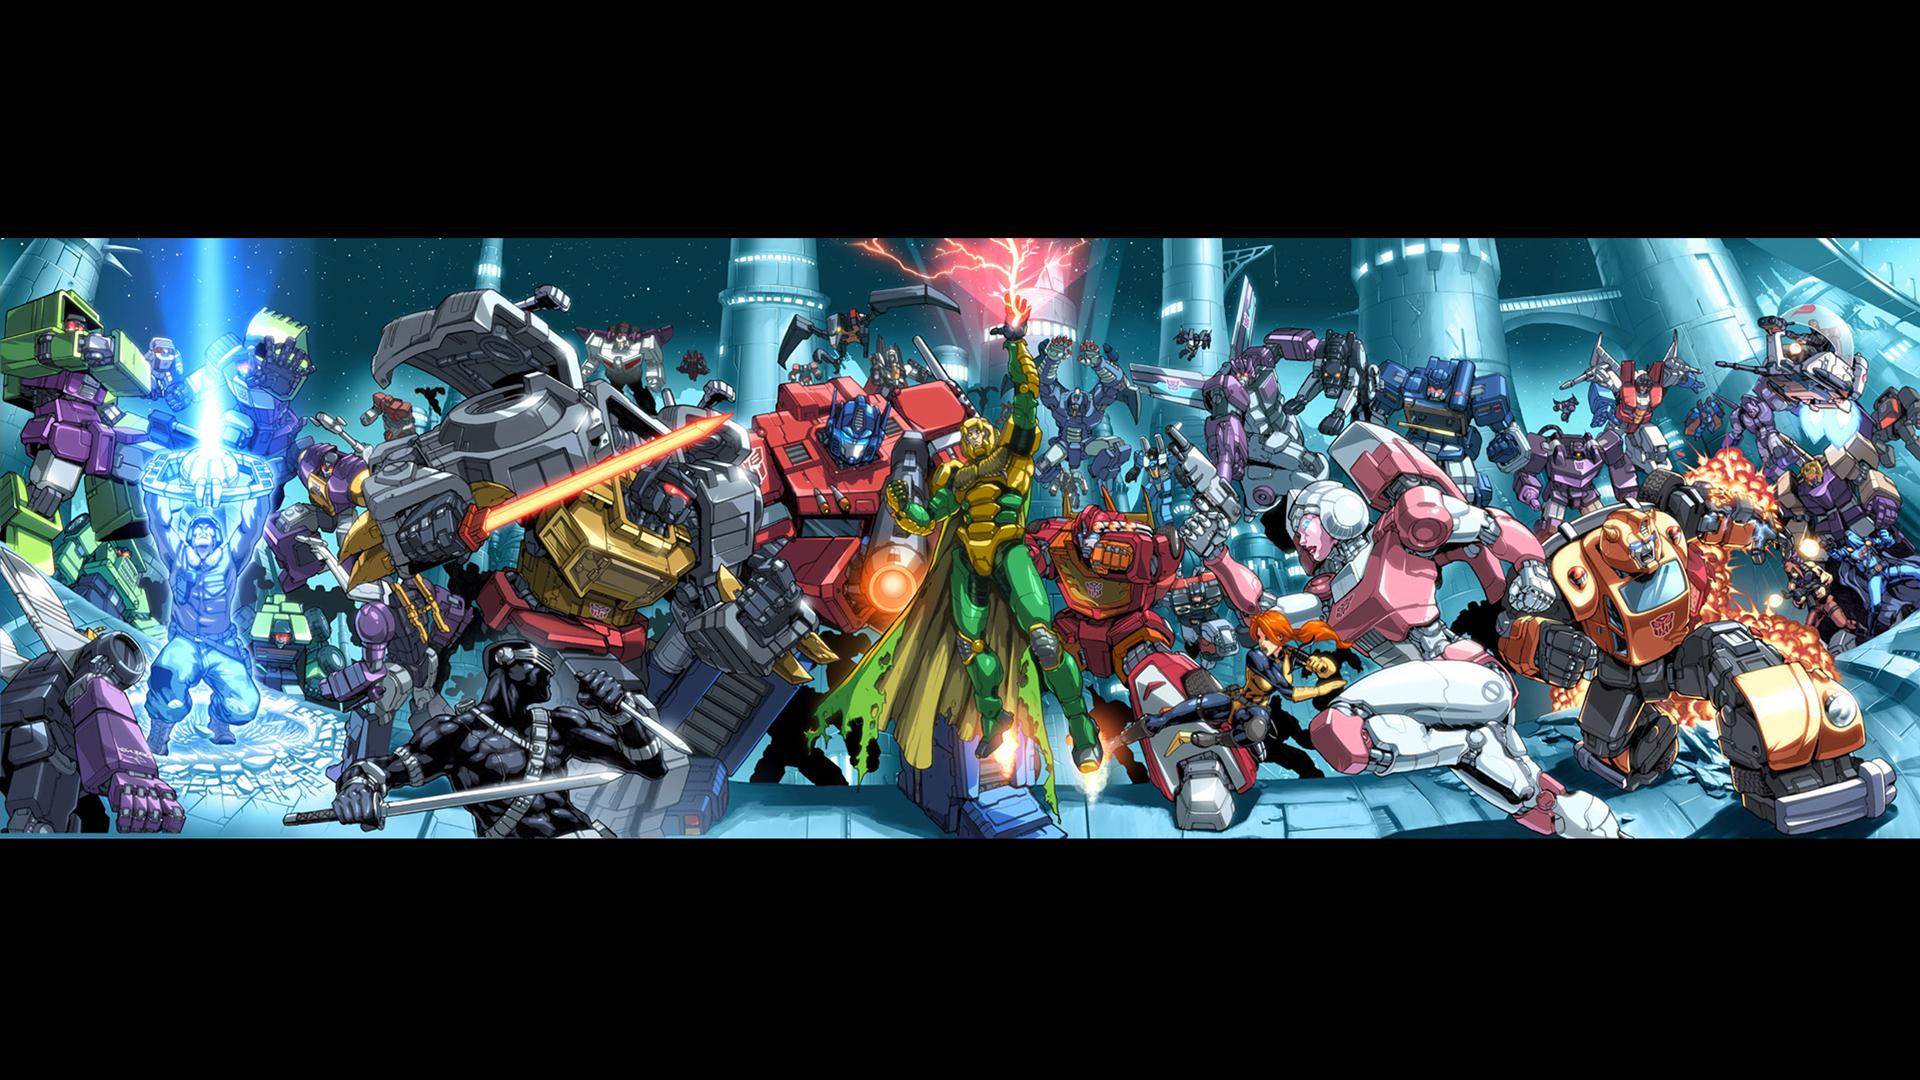 Fond D'écran : 1920x1080 Px, Fiora, GI Joe, Optimus Prime